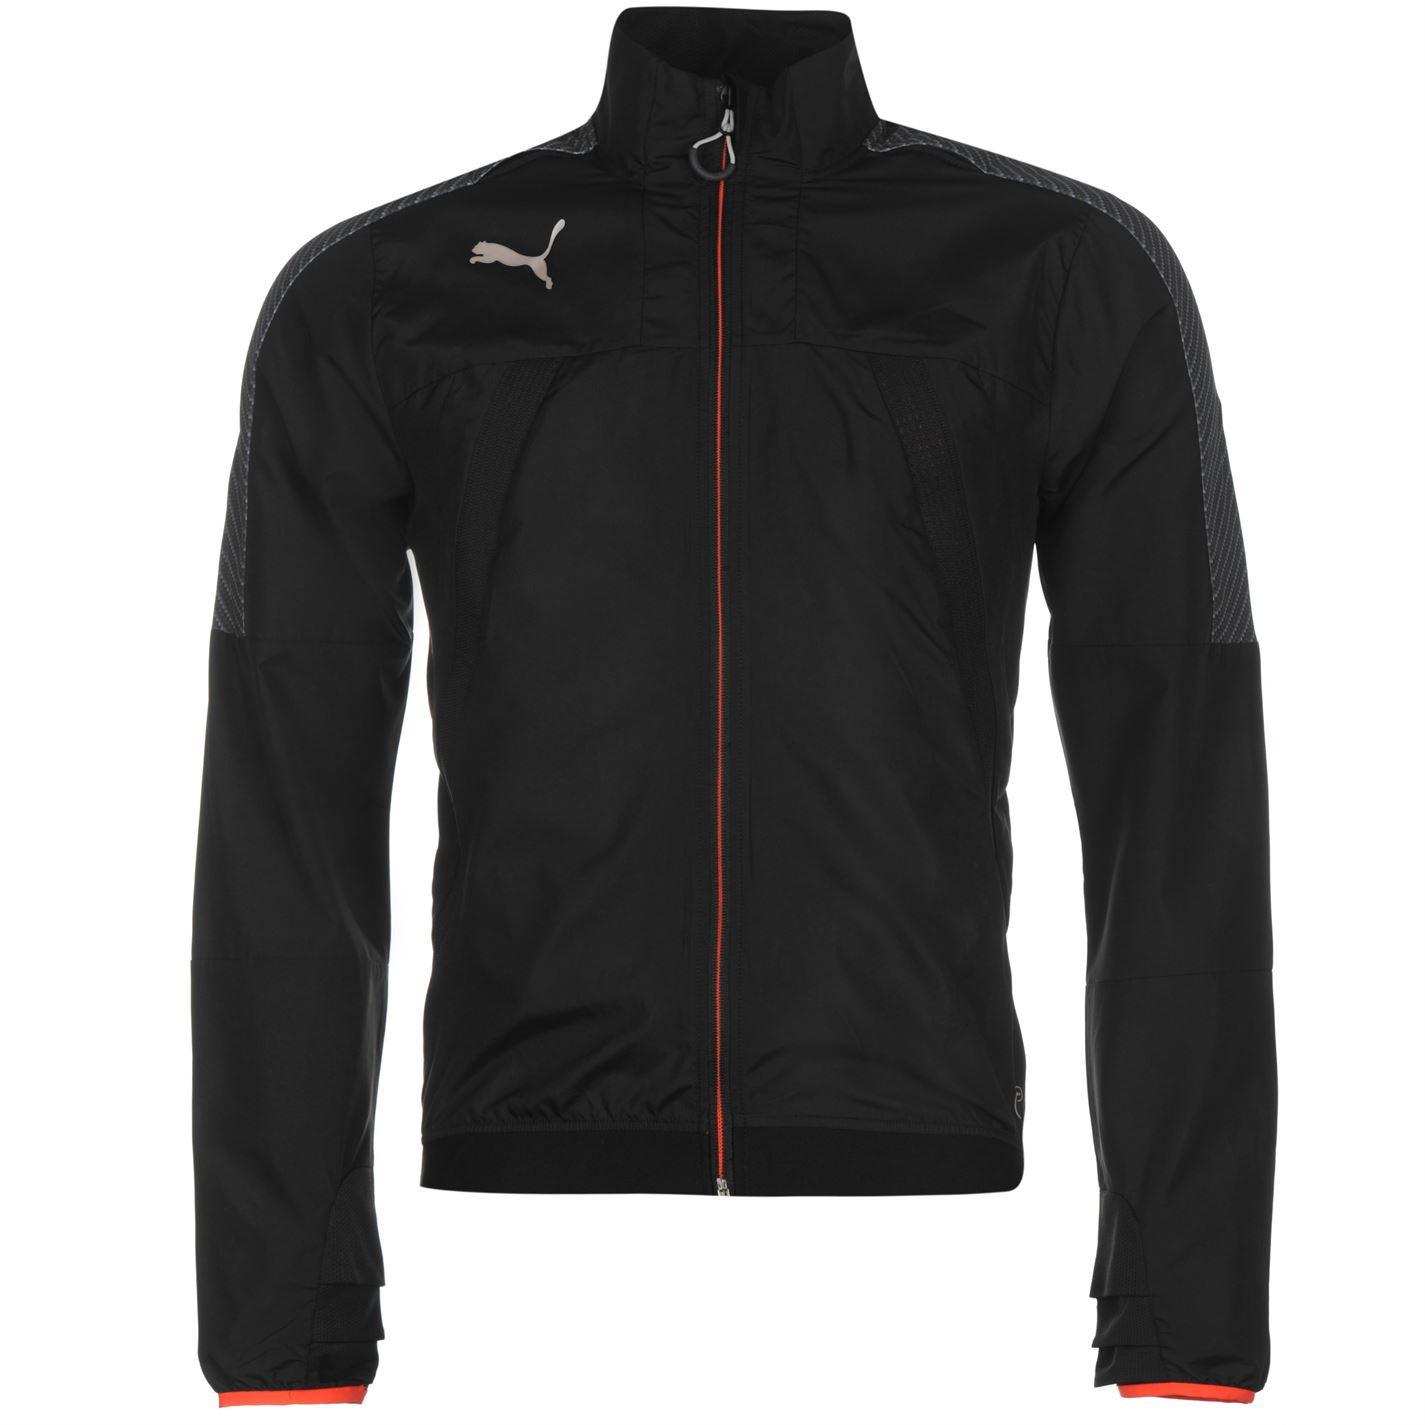 puma mens fashion clothing scuderia ferrari light jacket. Black Bedroom Furniture Sets. Home Design Ideas